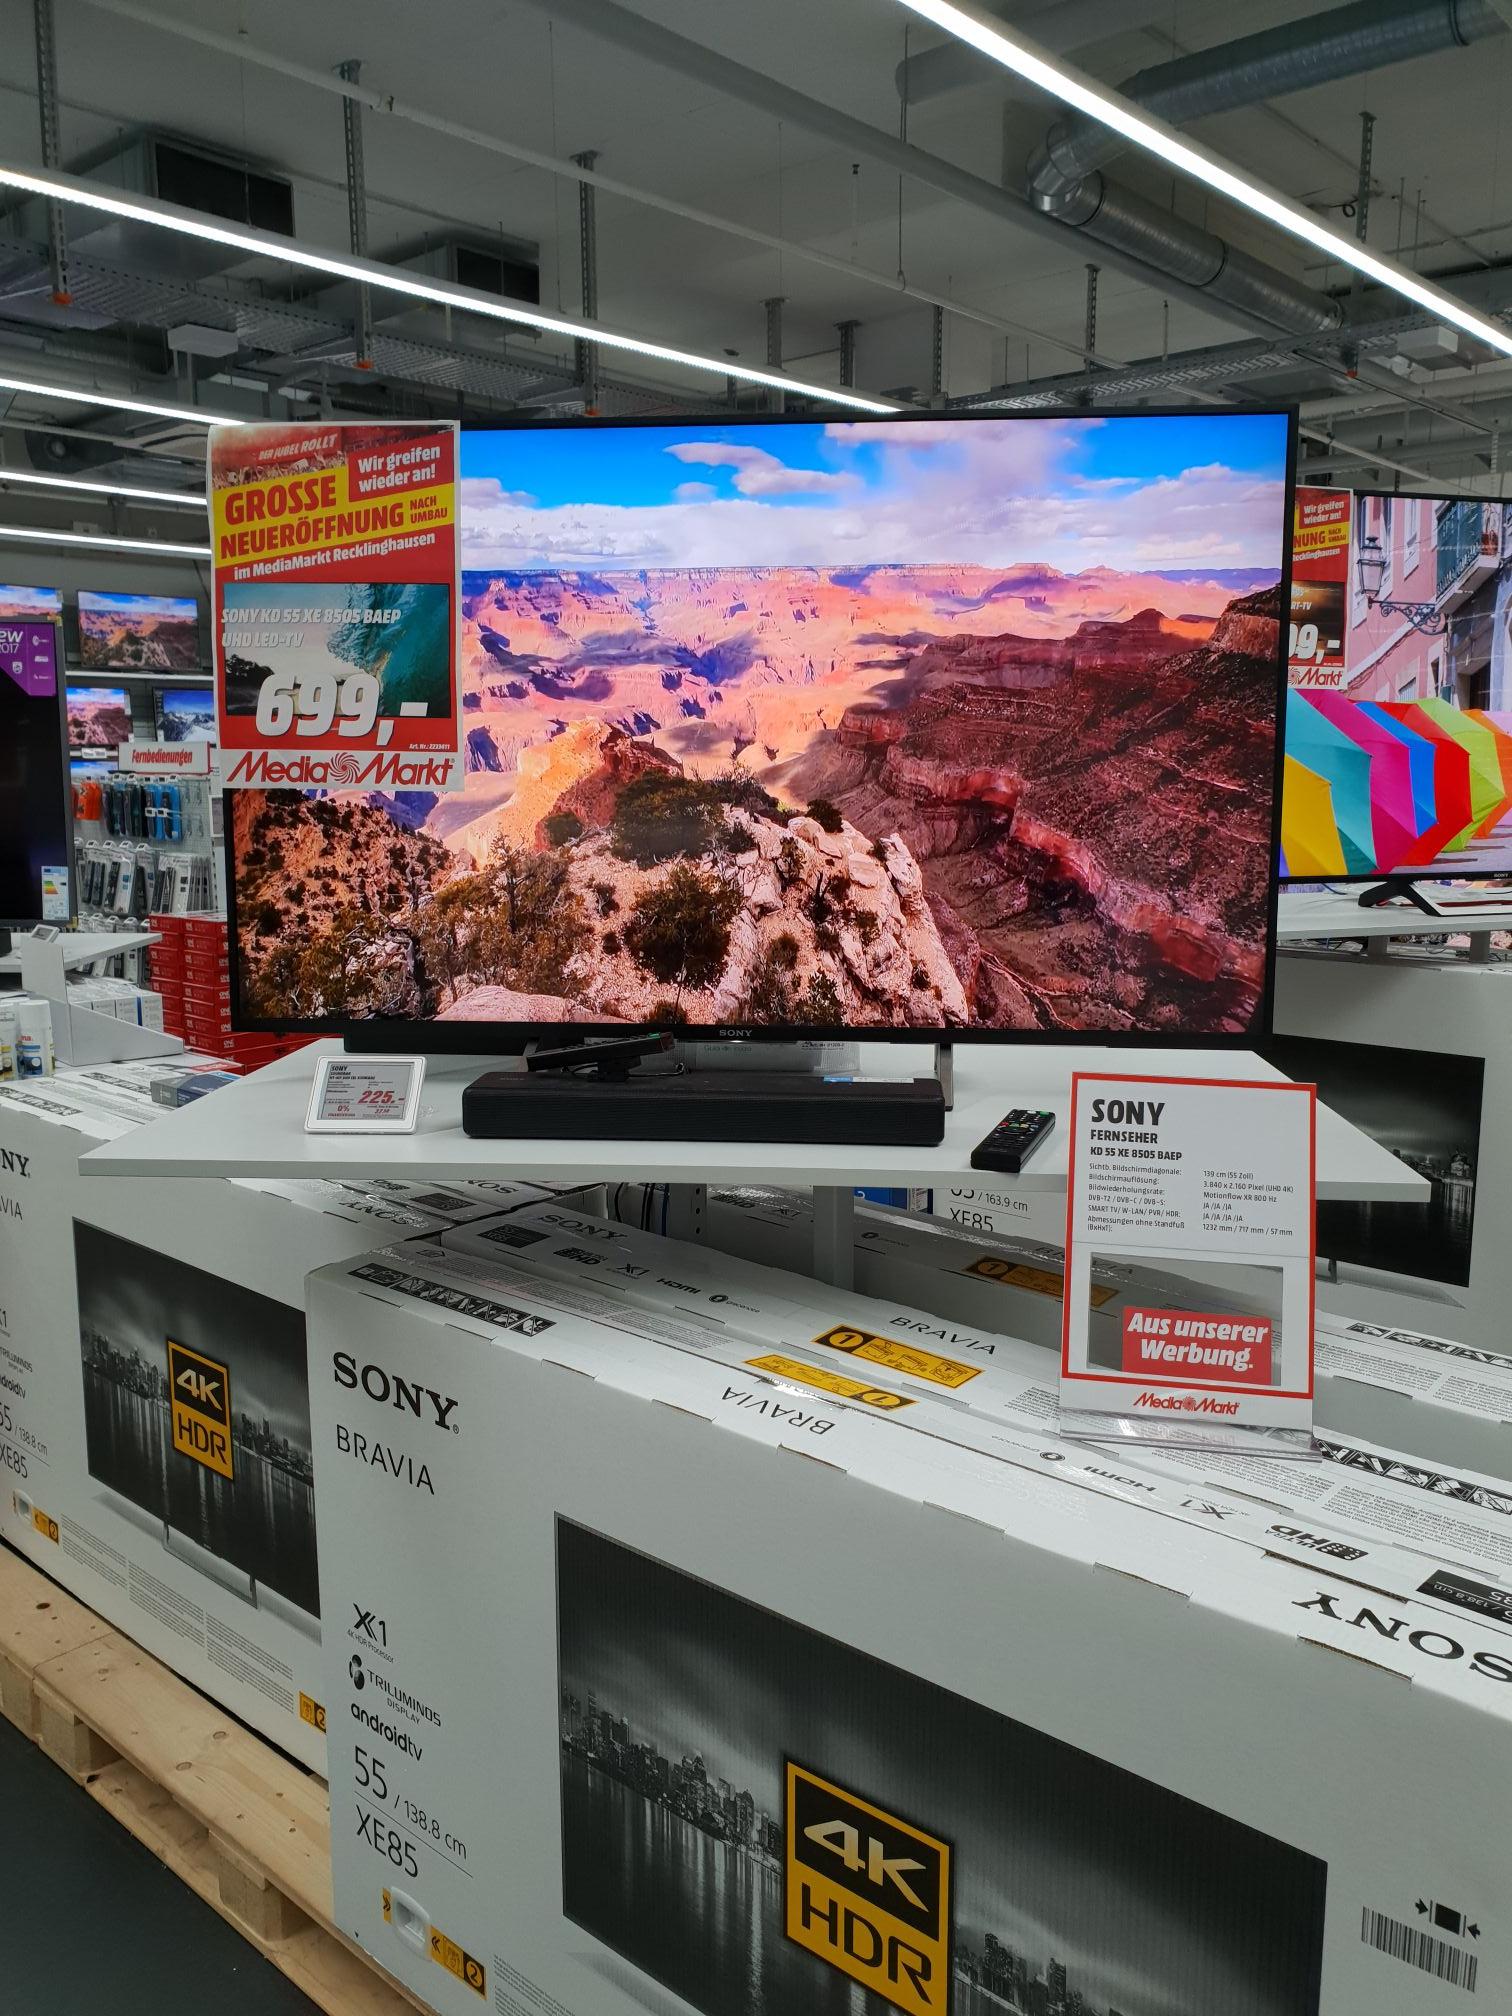 Sony KD-55XE8505 Media Markt Recklinghausen Lokal Große Neueröffnung